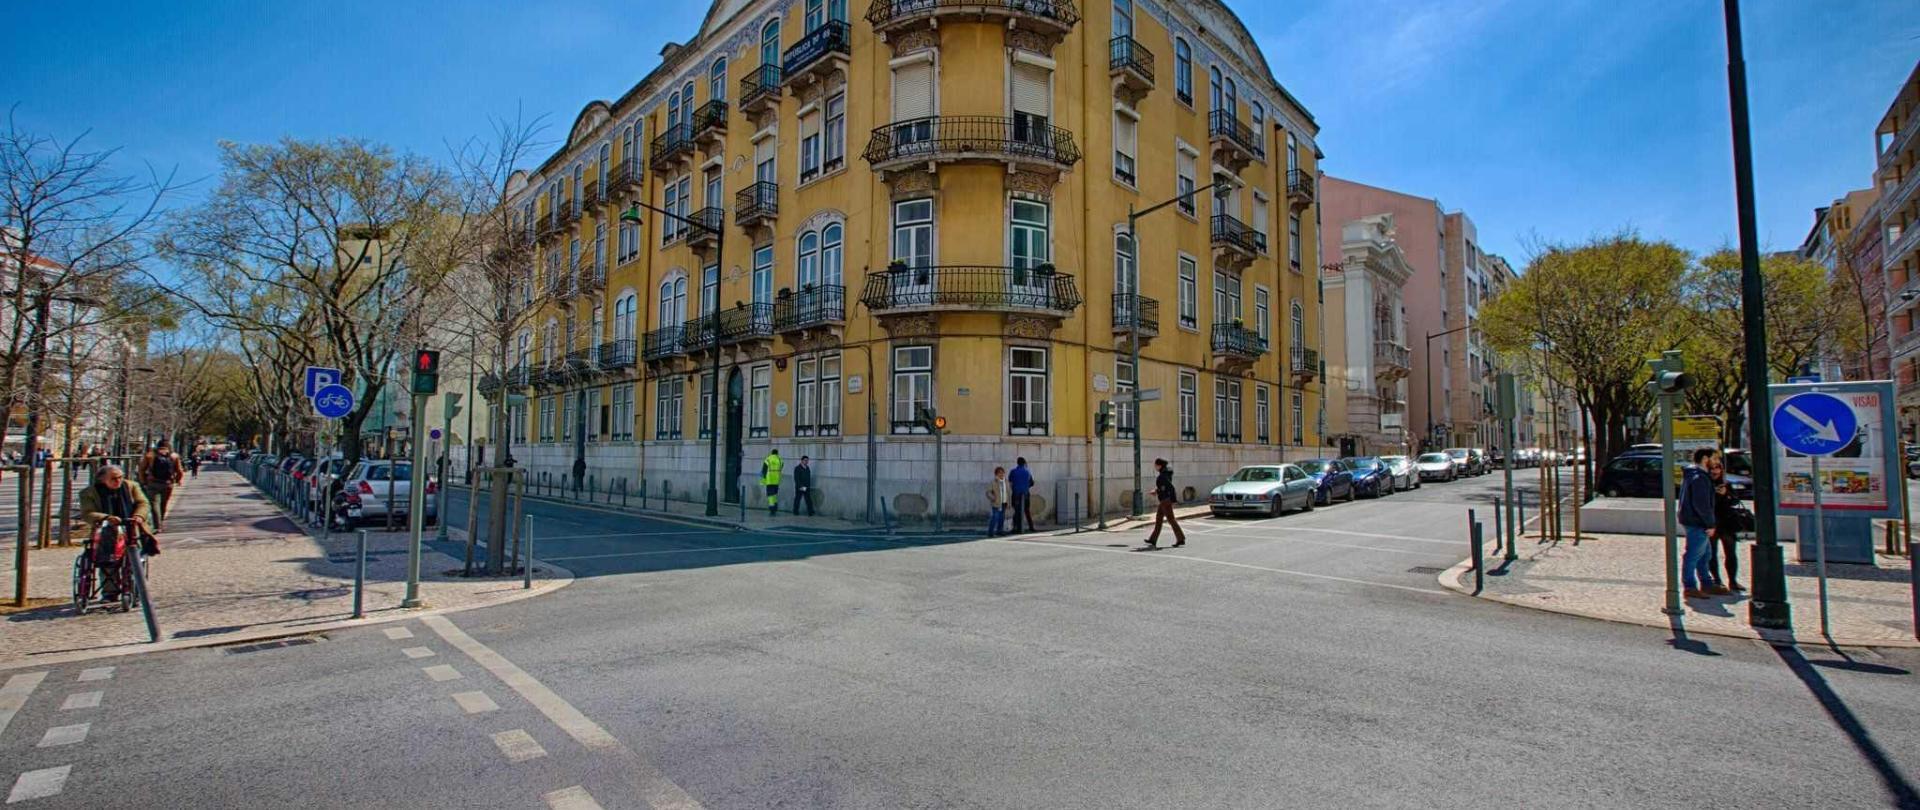 Chalet D Avila Guest House Lisboa Portugal